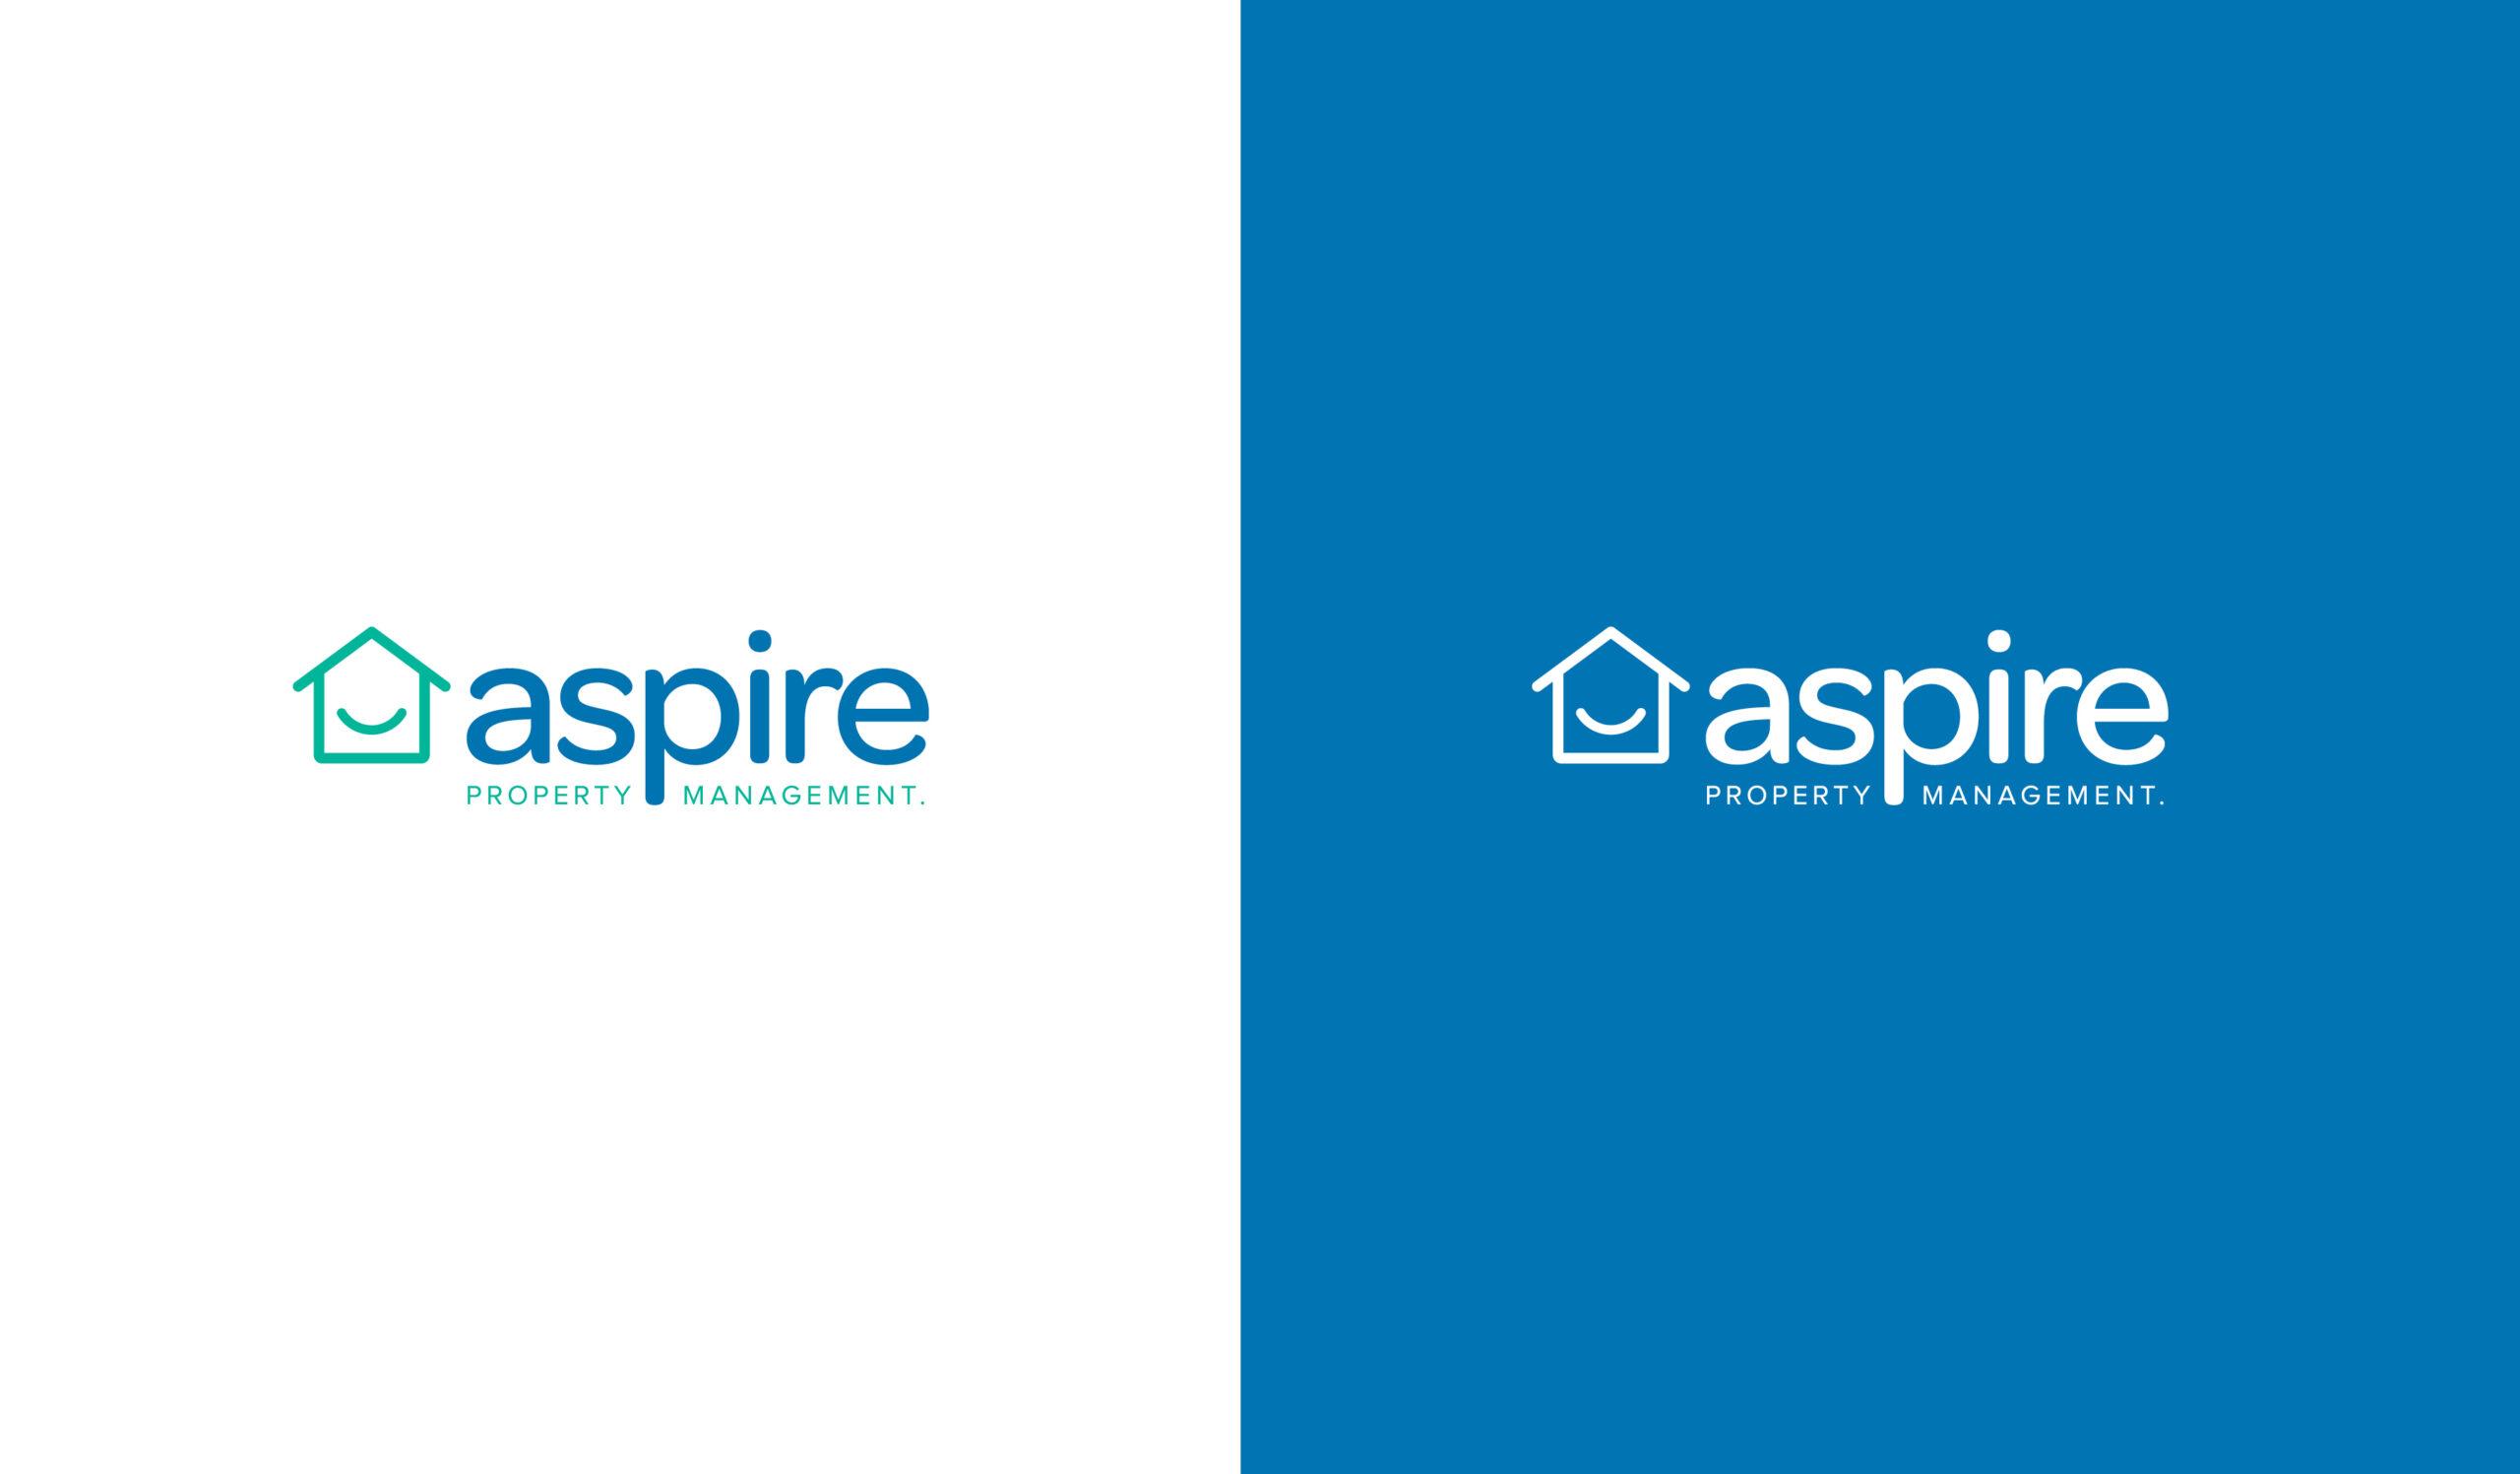 branding-graphic-design-aspire